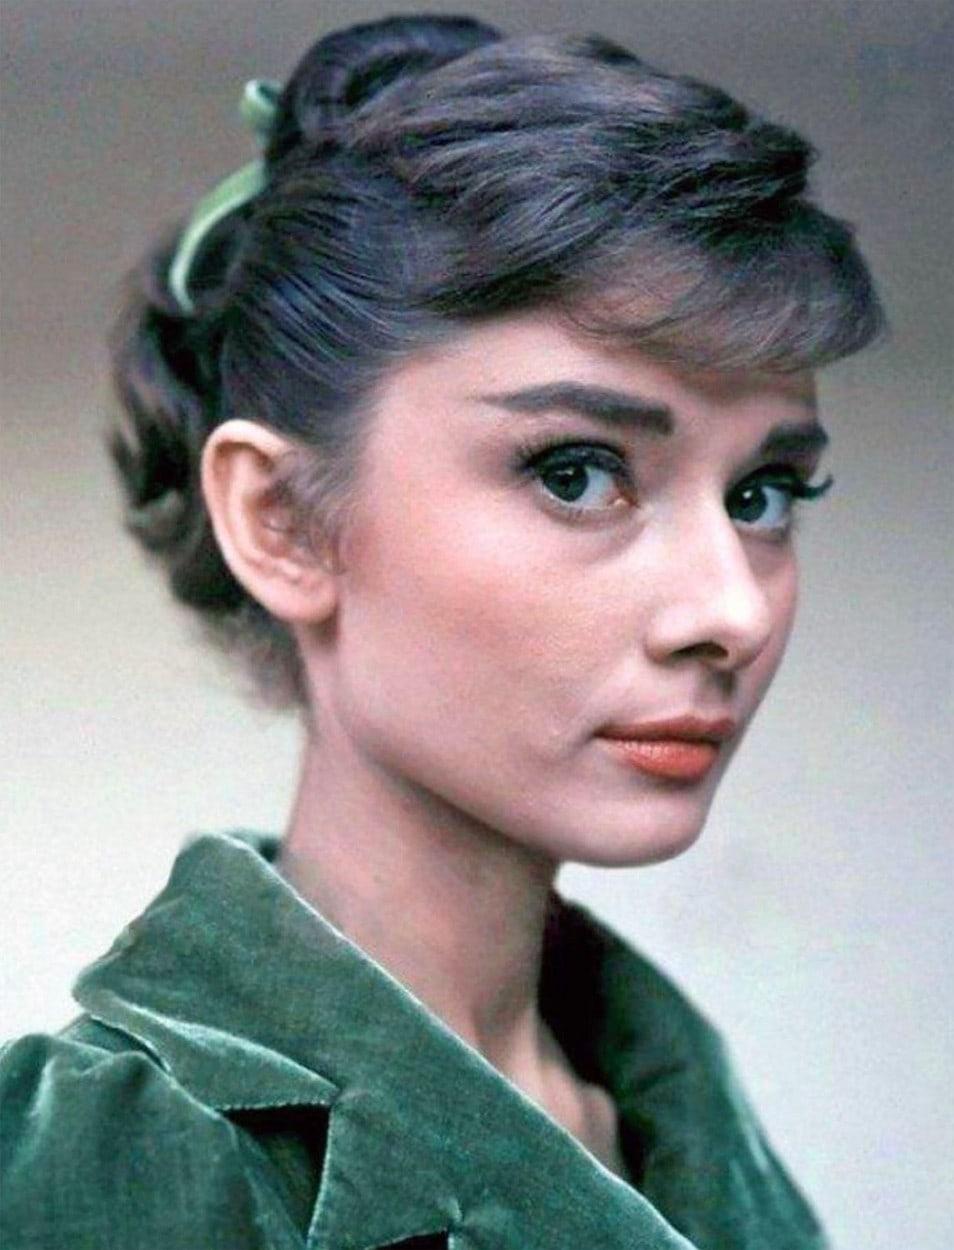 kultni beauty proizvodi Audrey Hepburn Profimedia